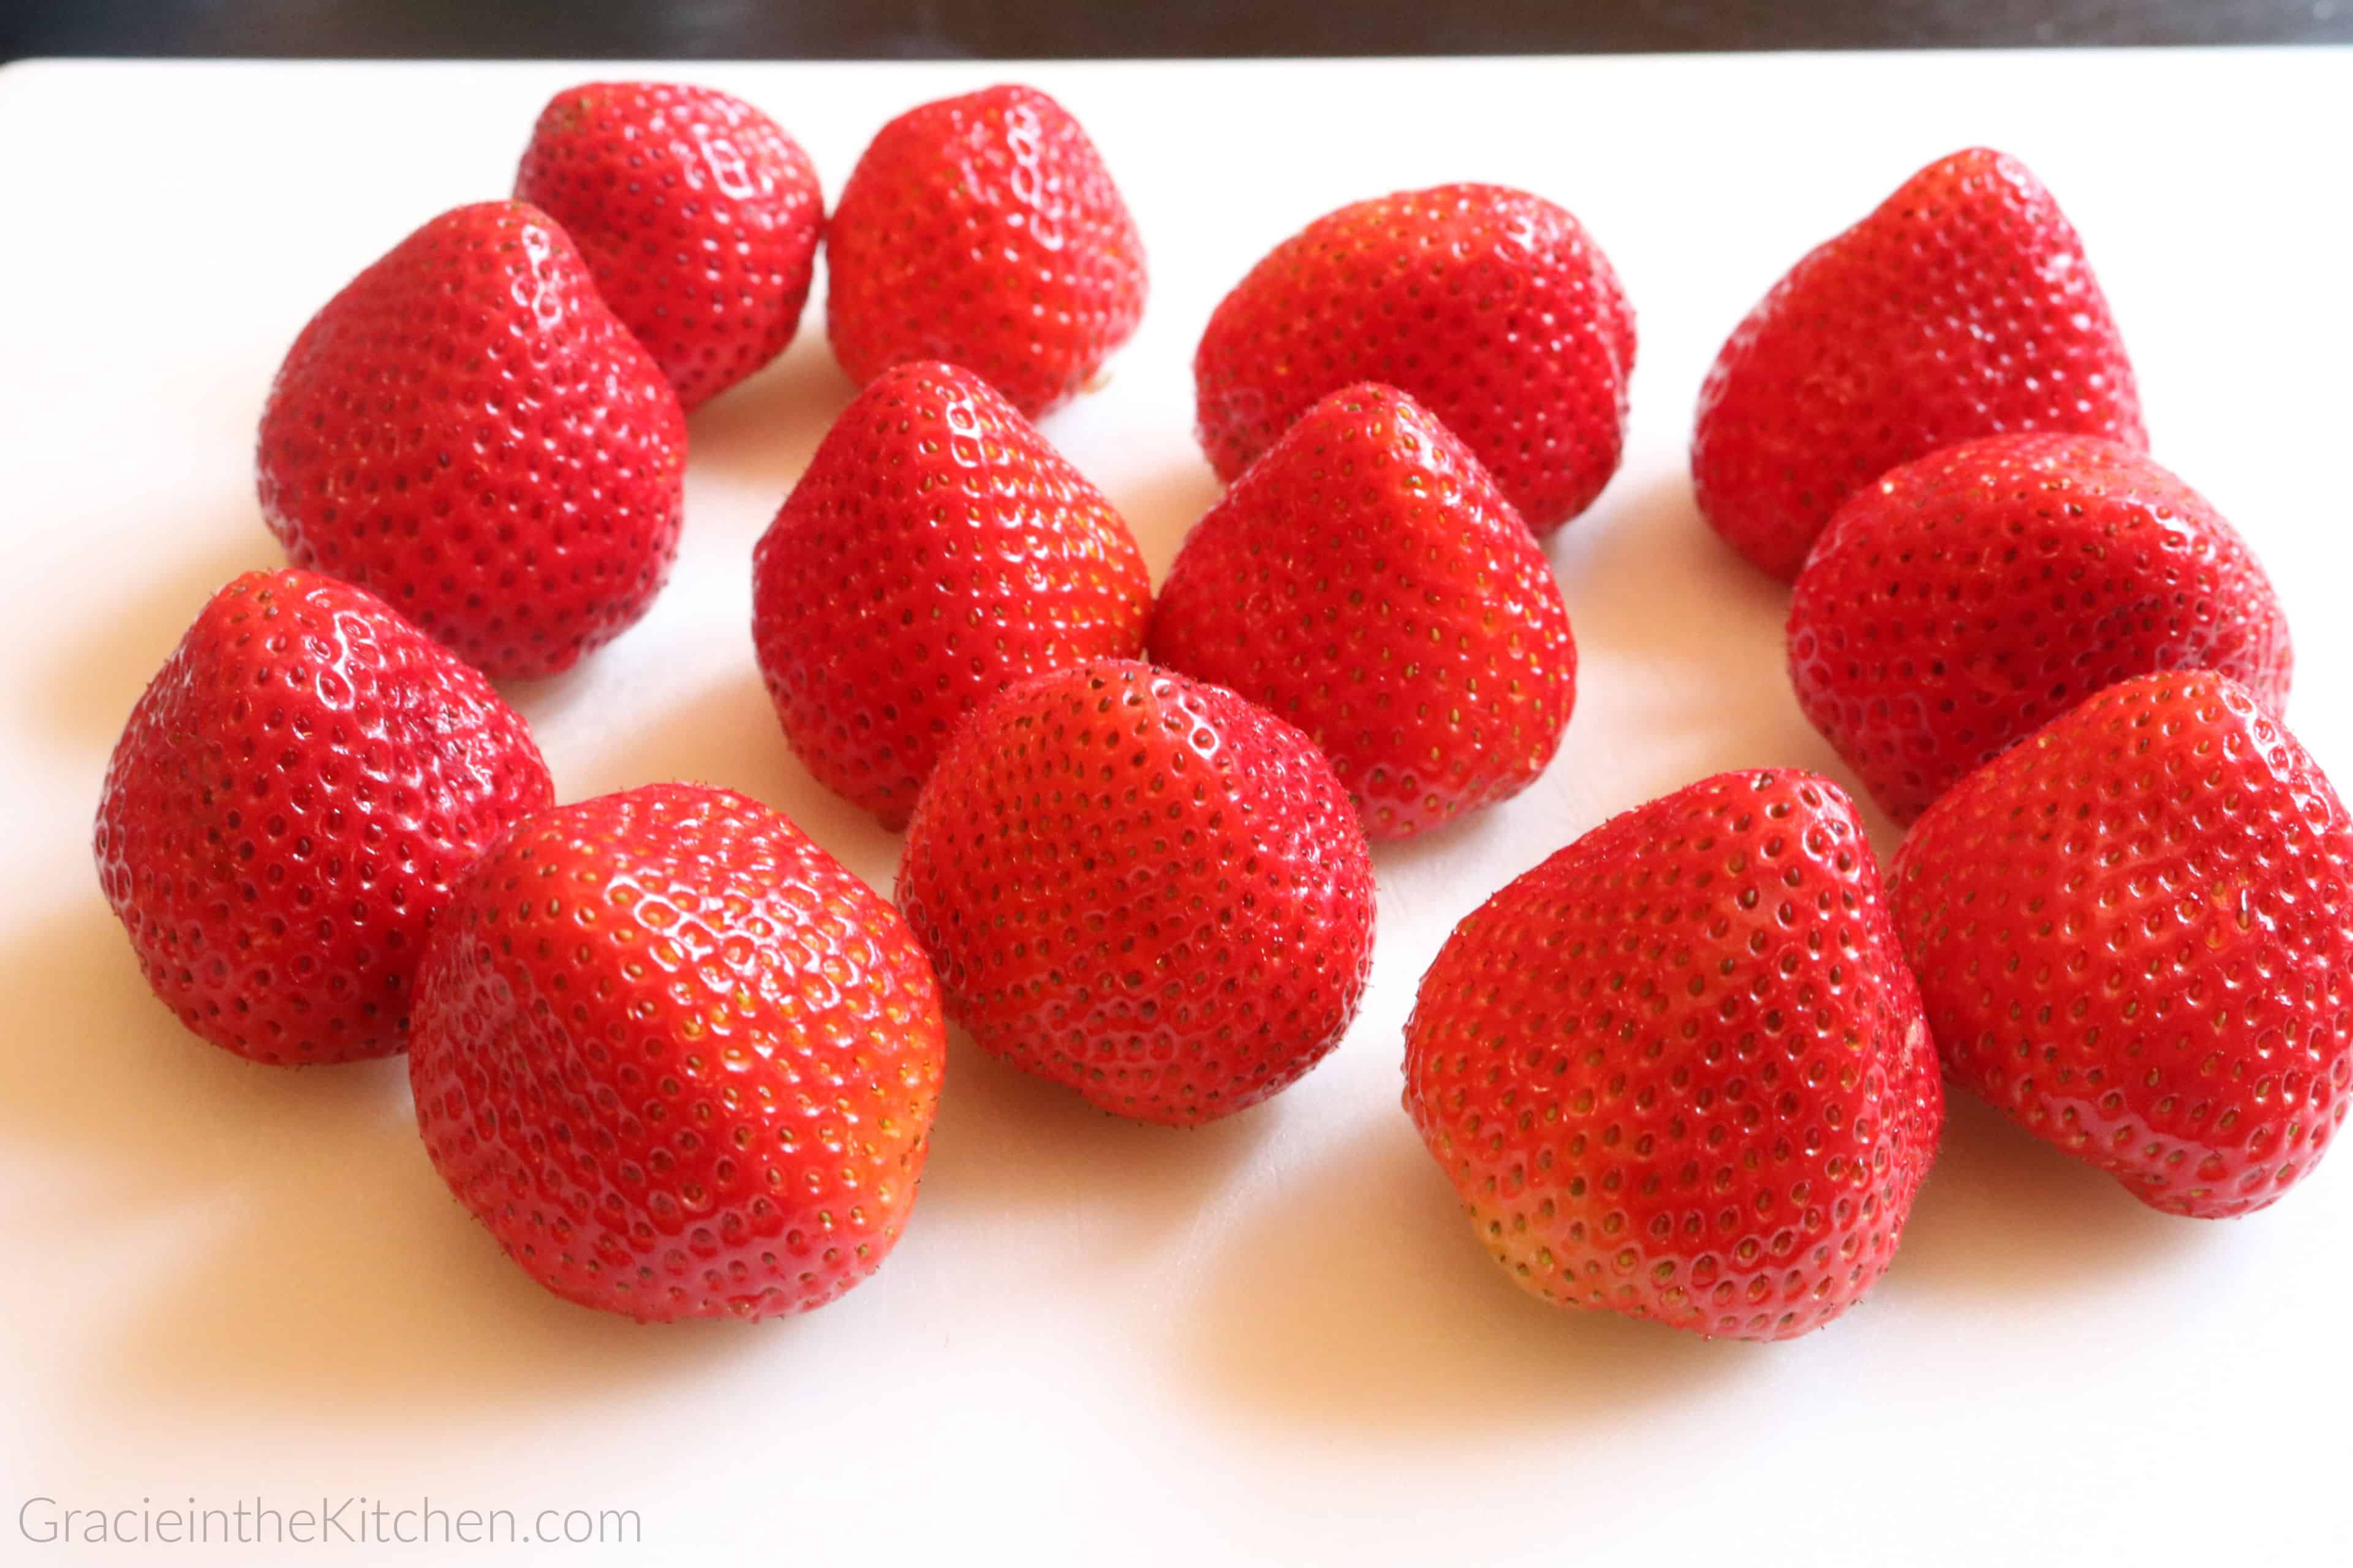 Macerated Strawberries Recipe- So easy!